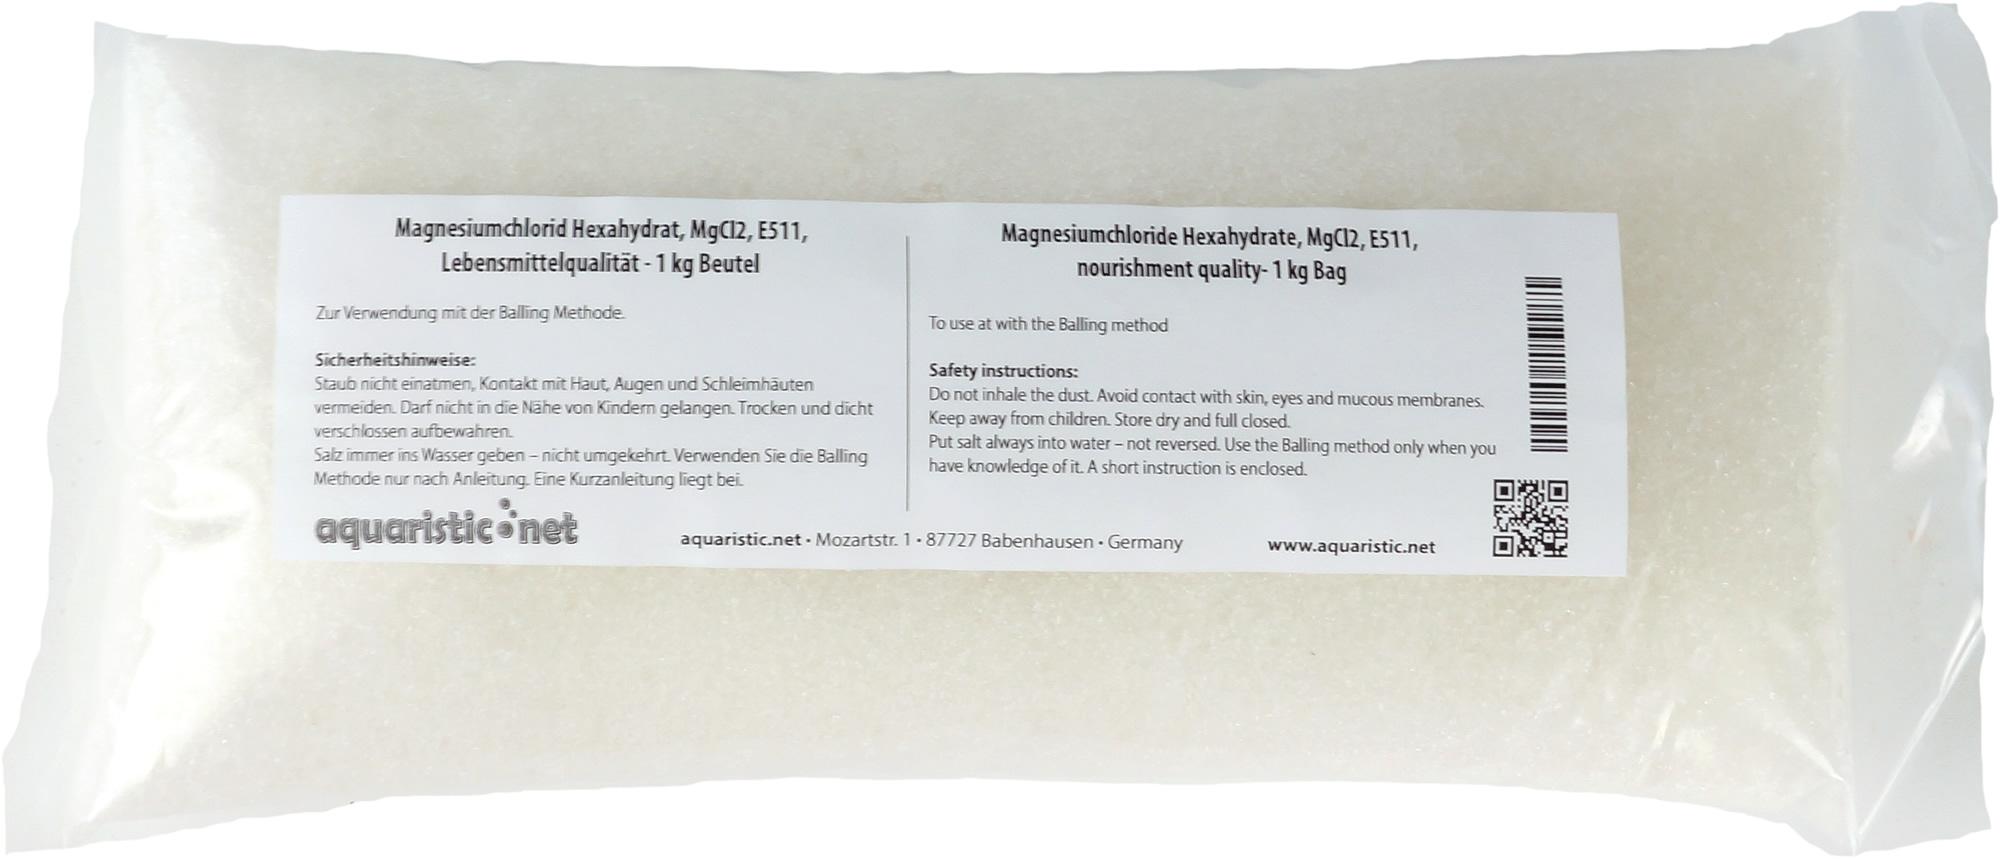 Magnesiumchlorid Hexahydrat, MgCl2, E511, Lebensmittelqualität